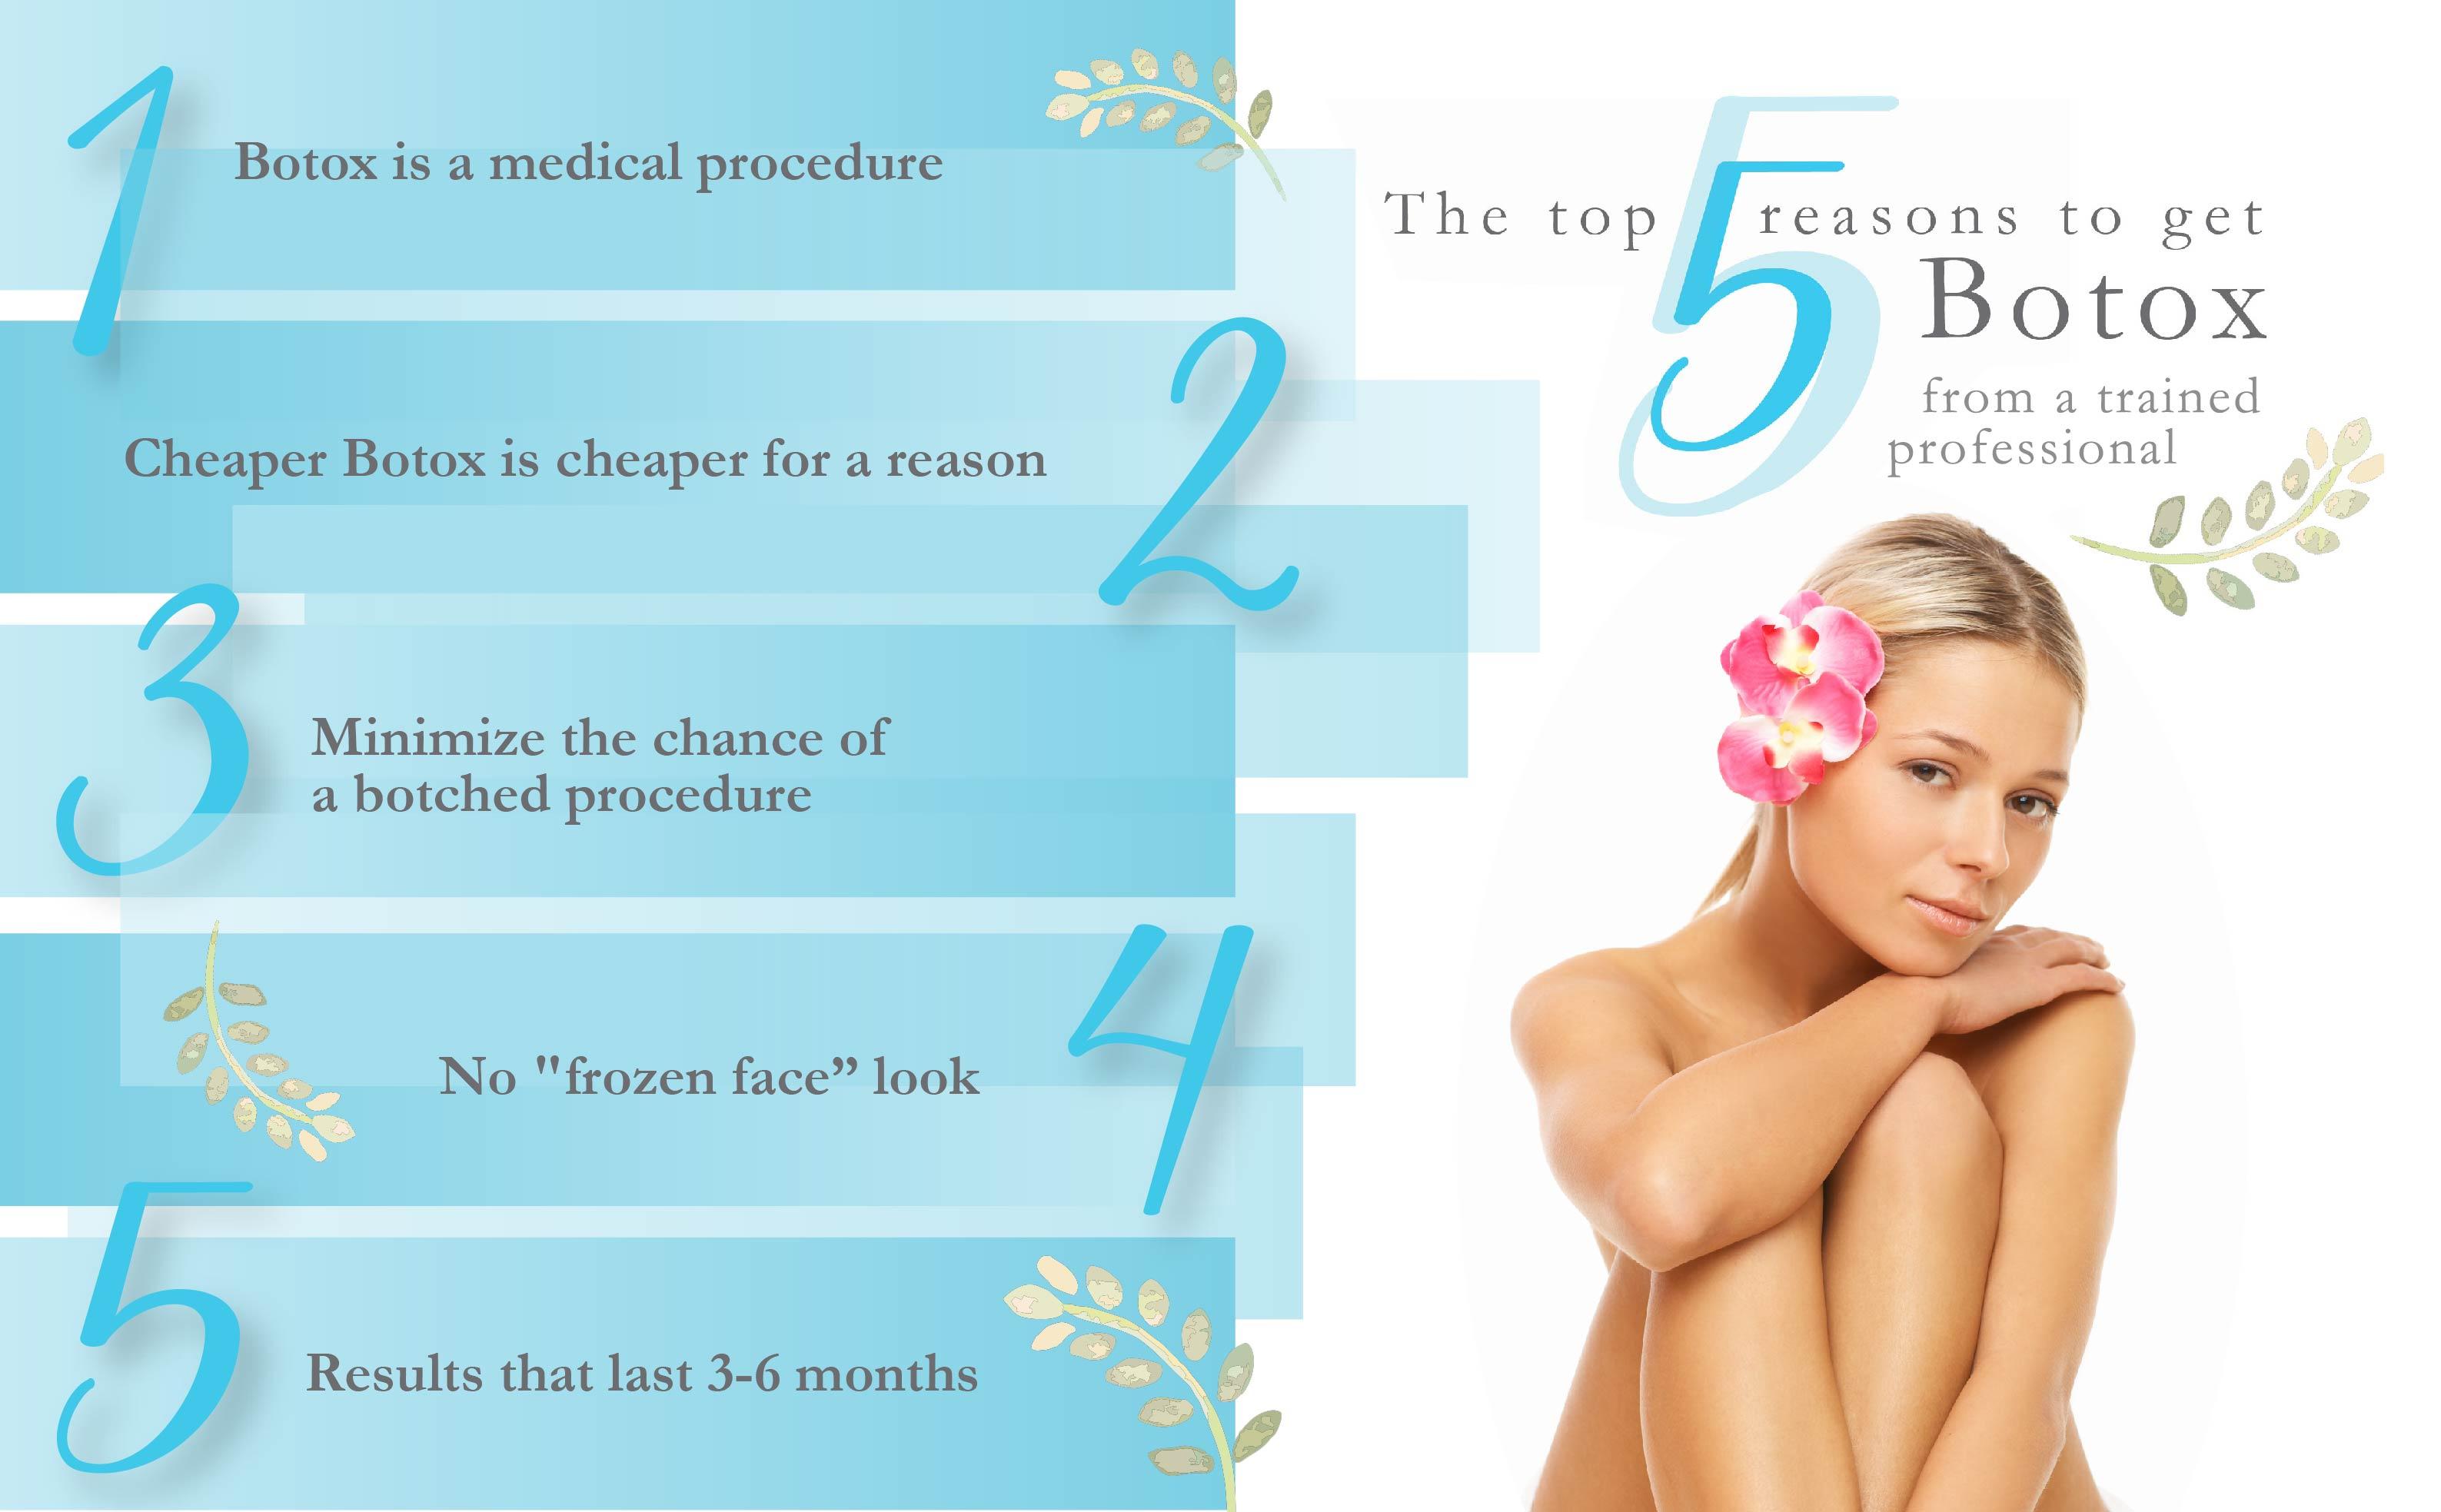 Top reasons to get Botox